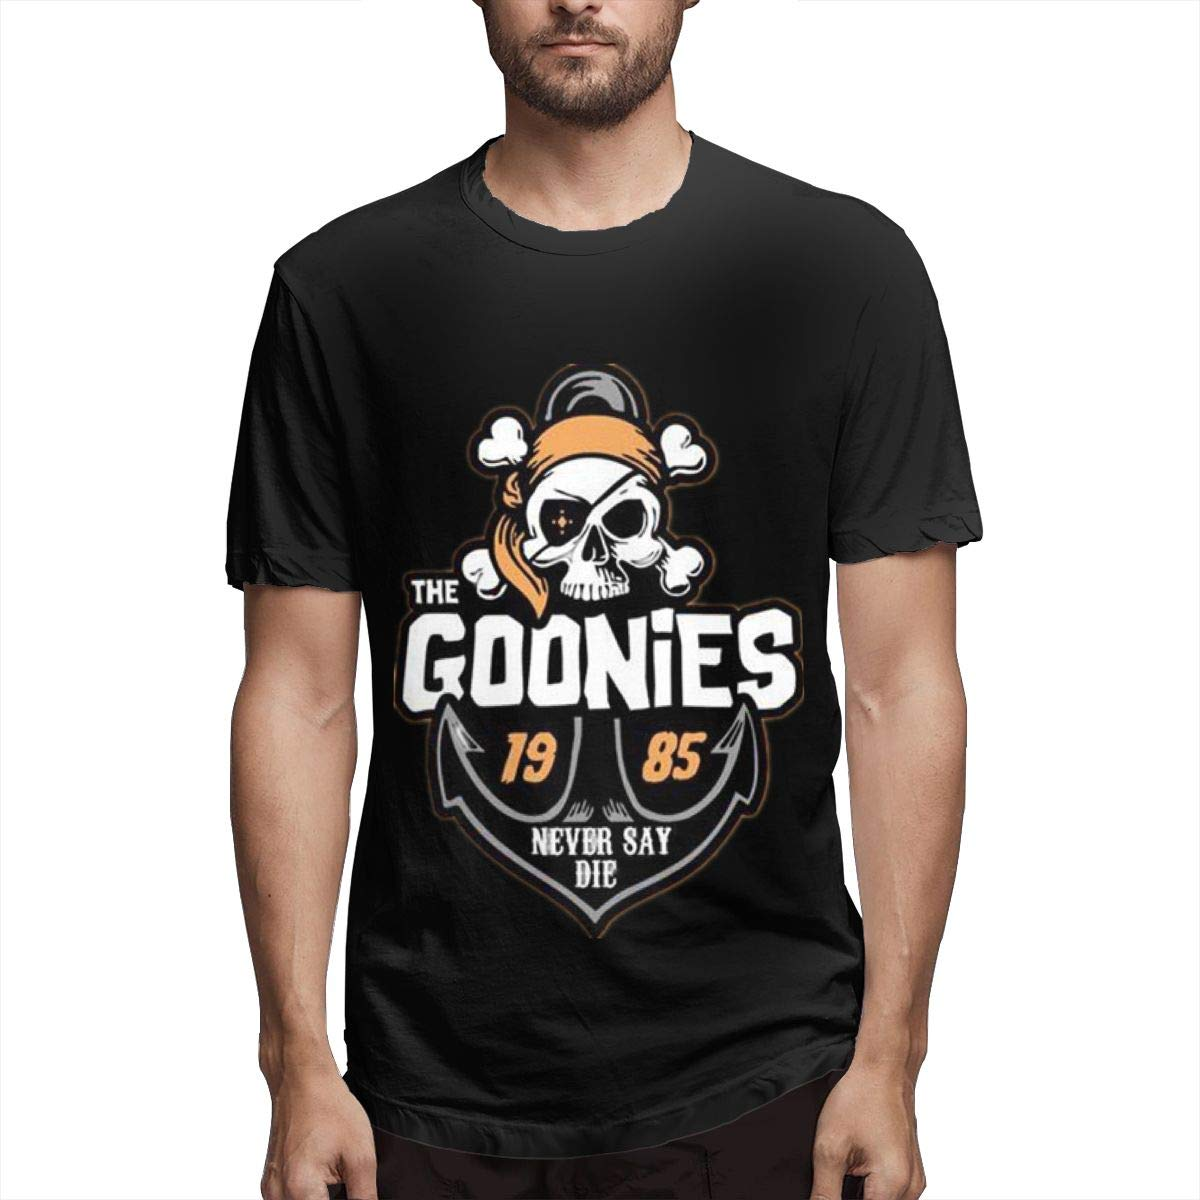 Lihehen Mans Goonies Logo Fashion Leisure Round Neck Tees Shirts